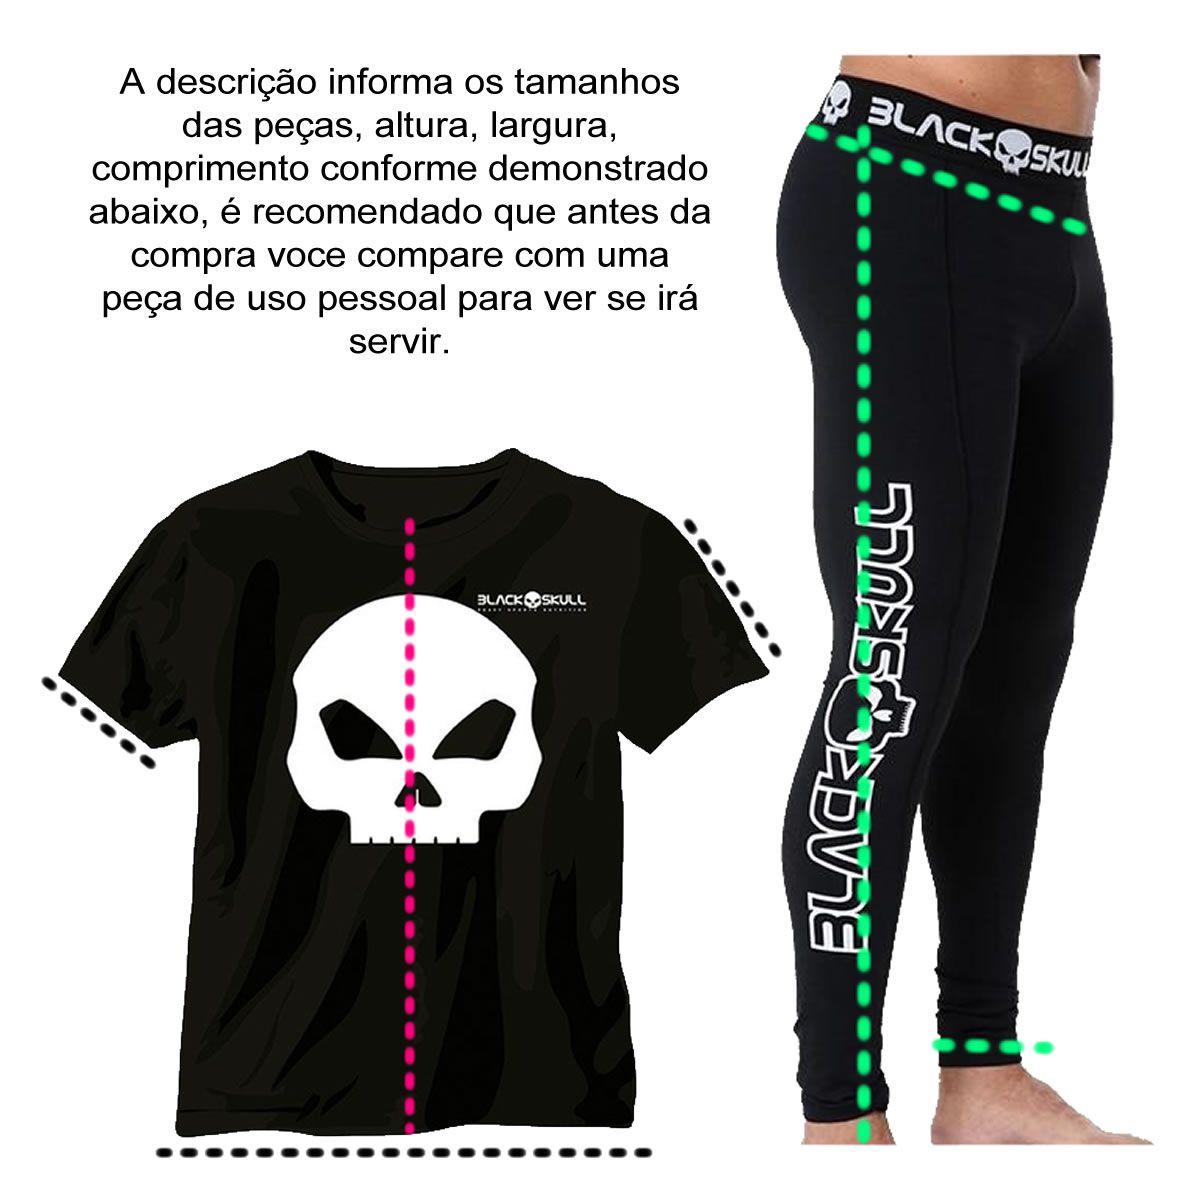 Legging Mist Preto - Black Skull